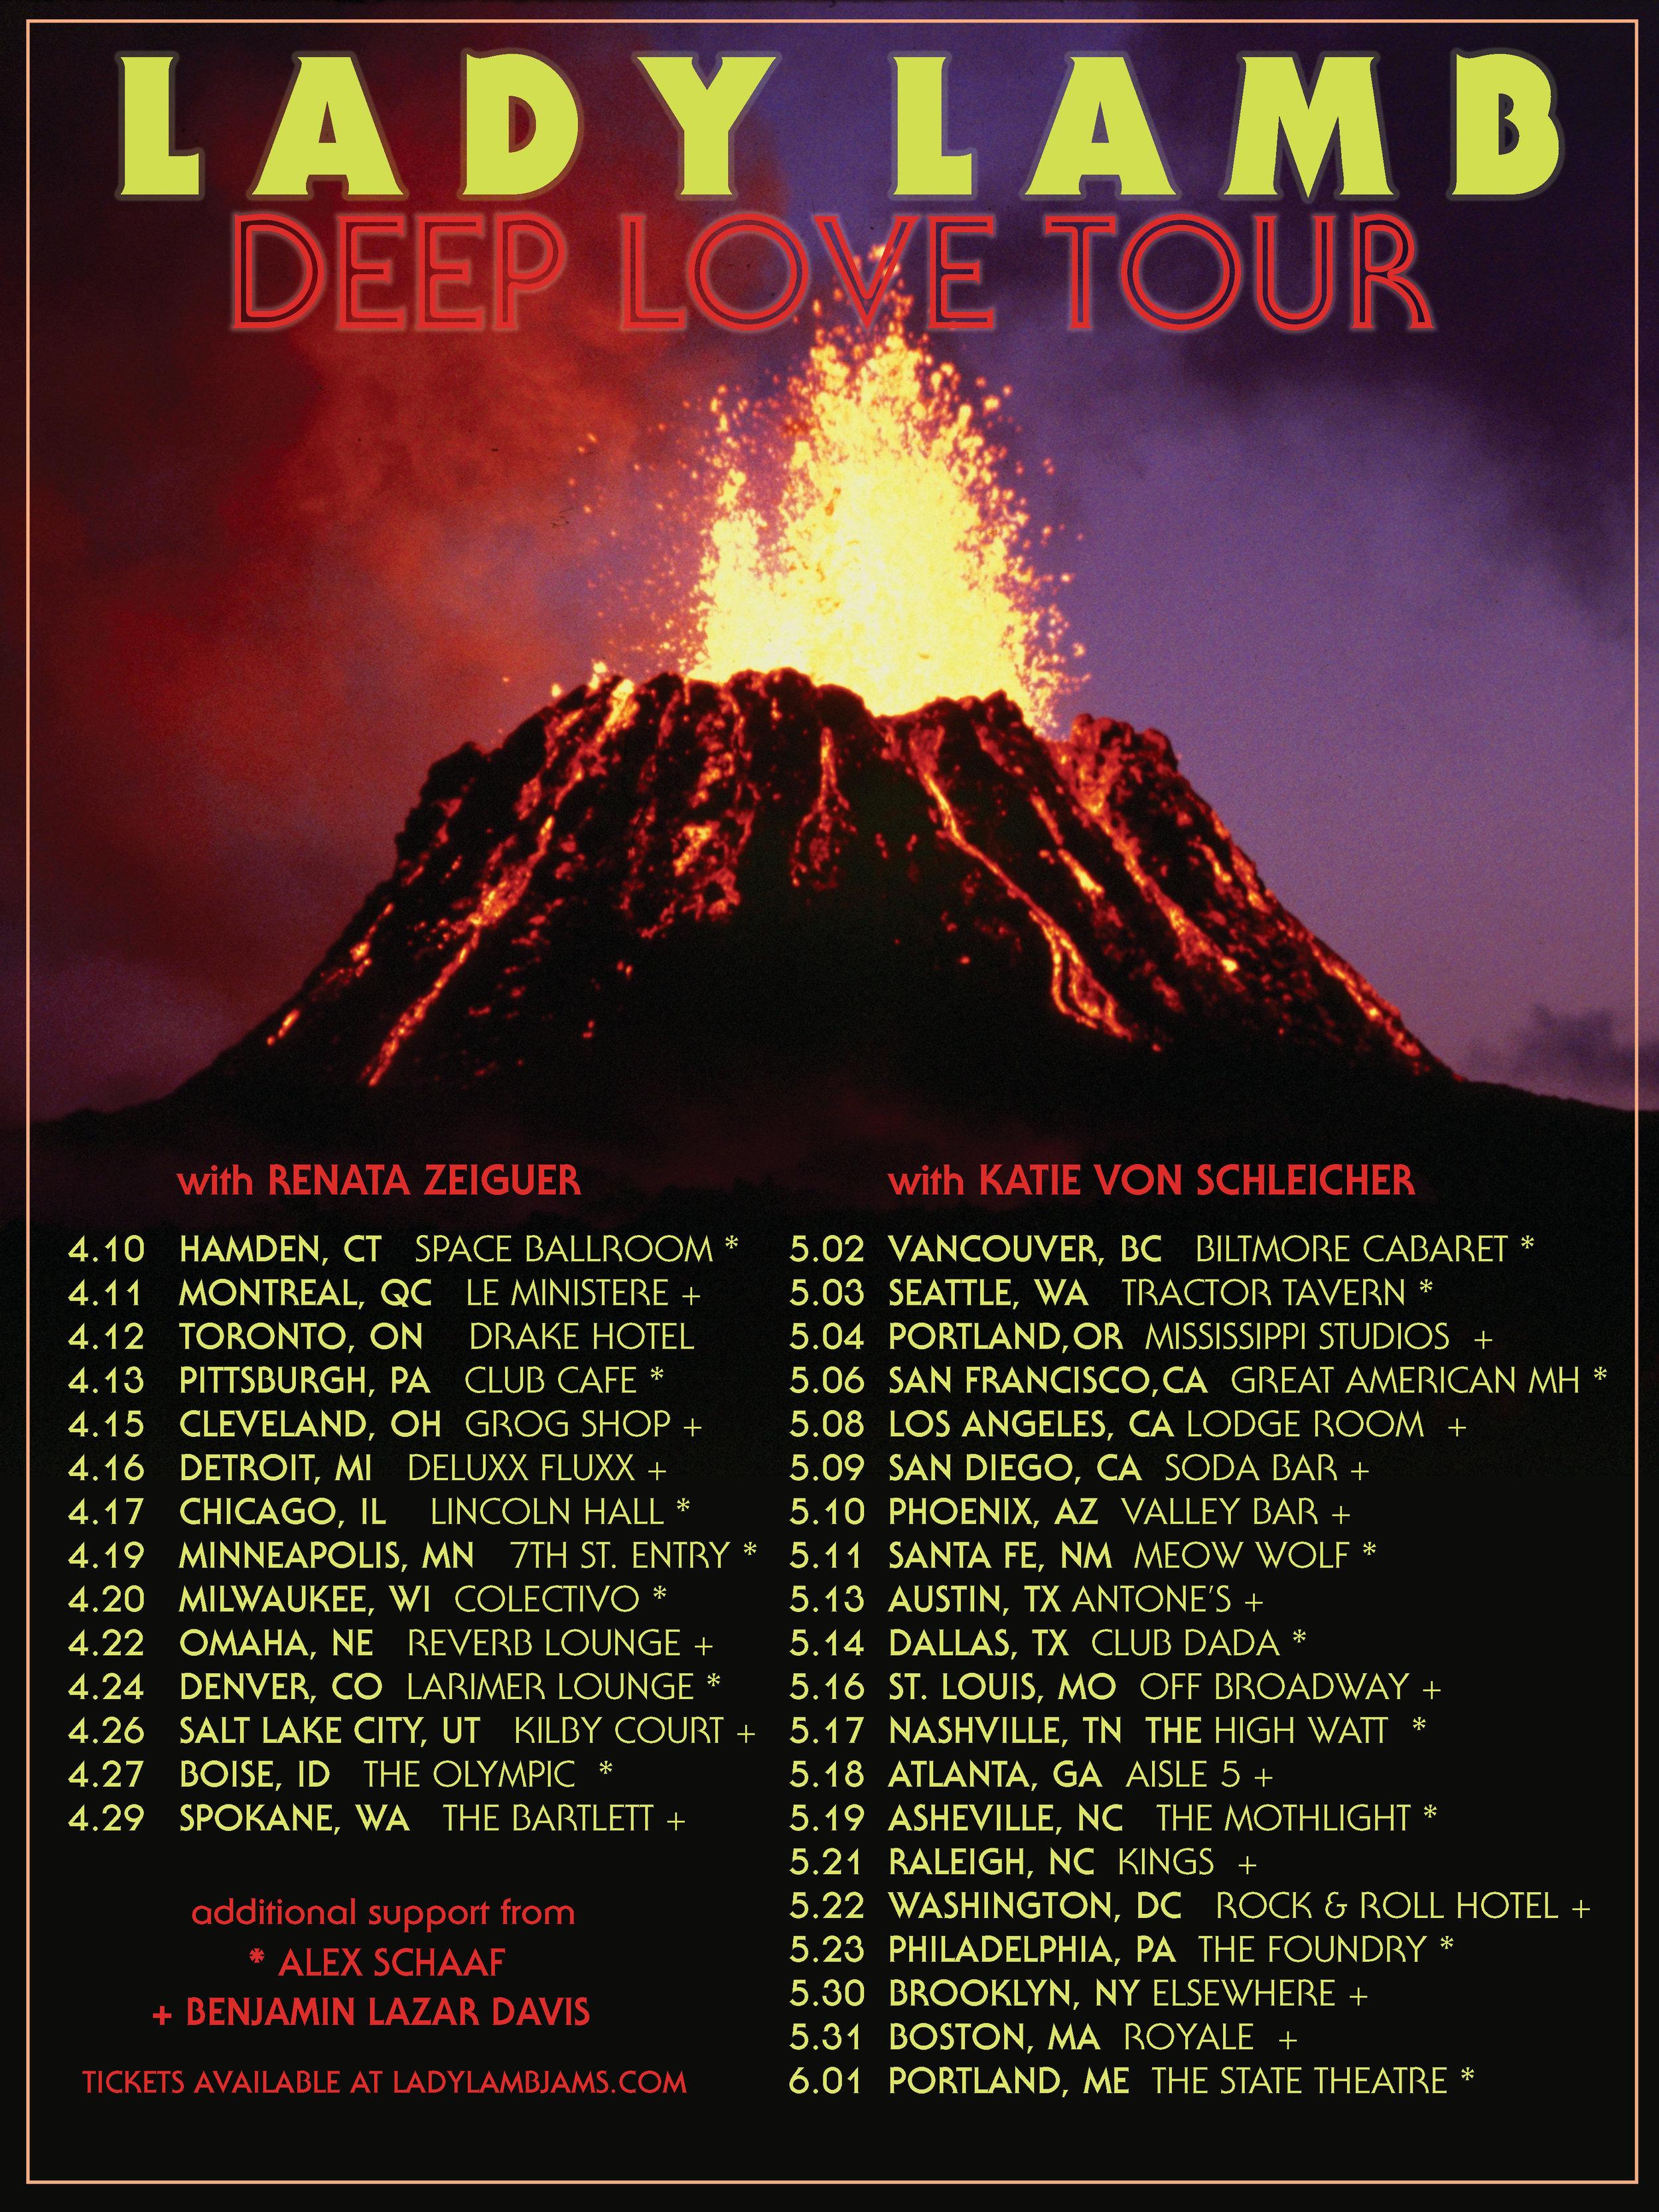 Deep Love tour dates.